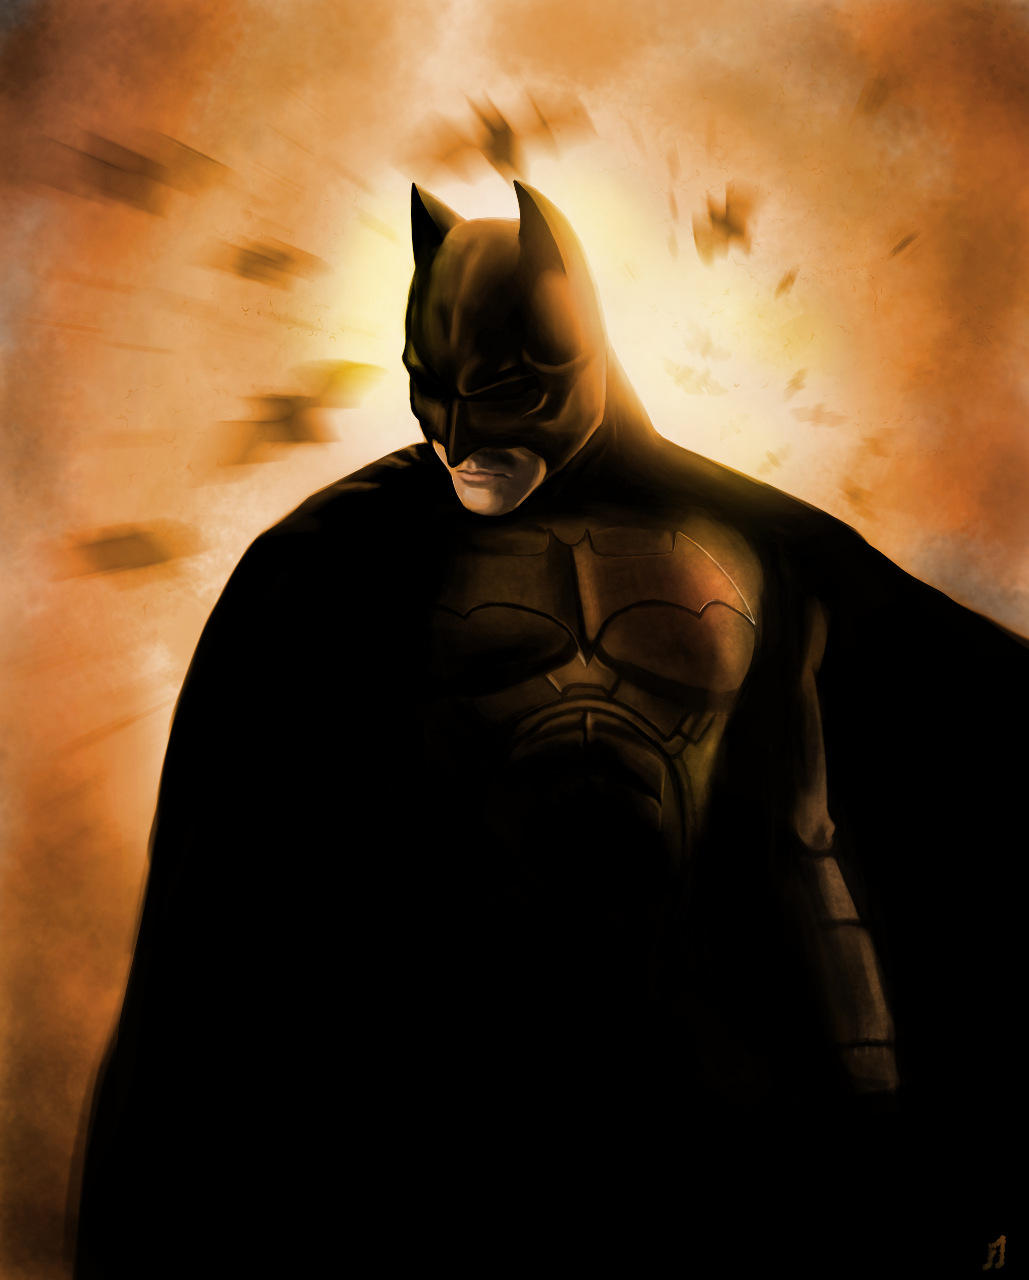 The Dark Knight by Matou31